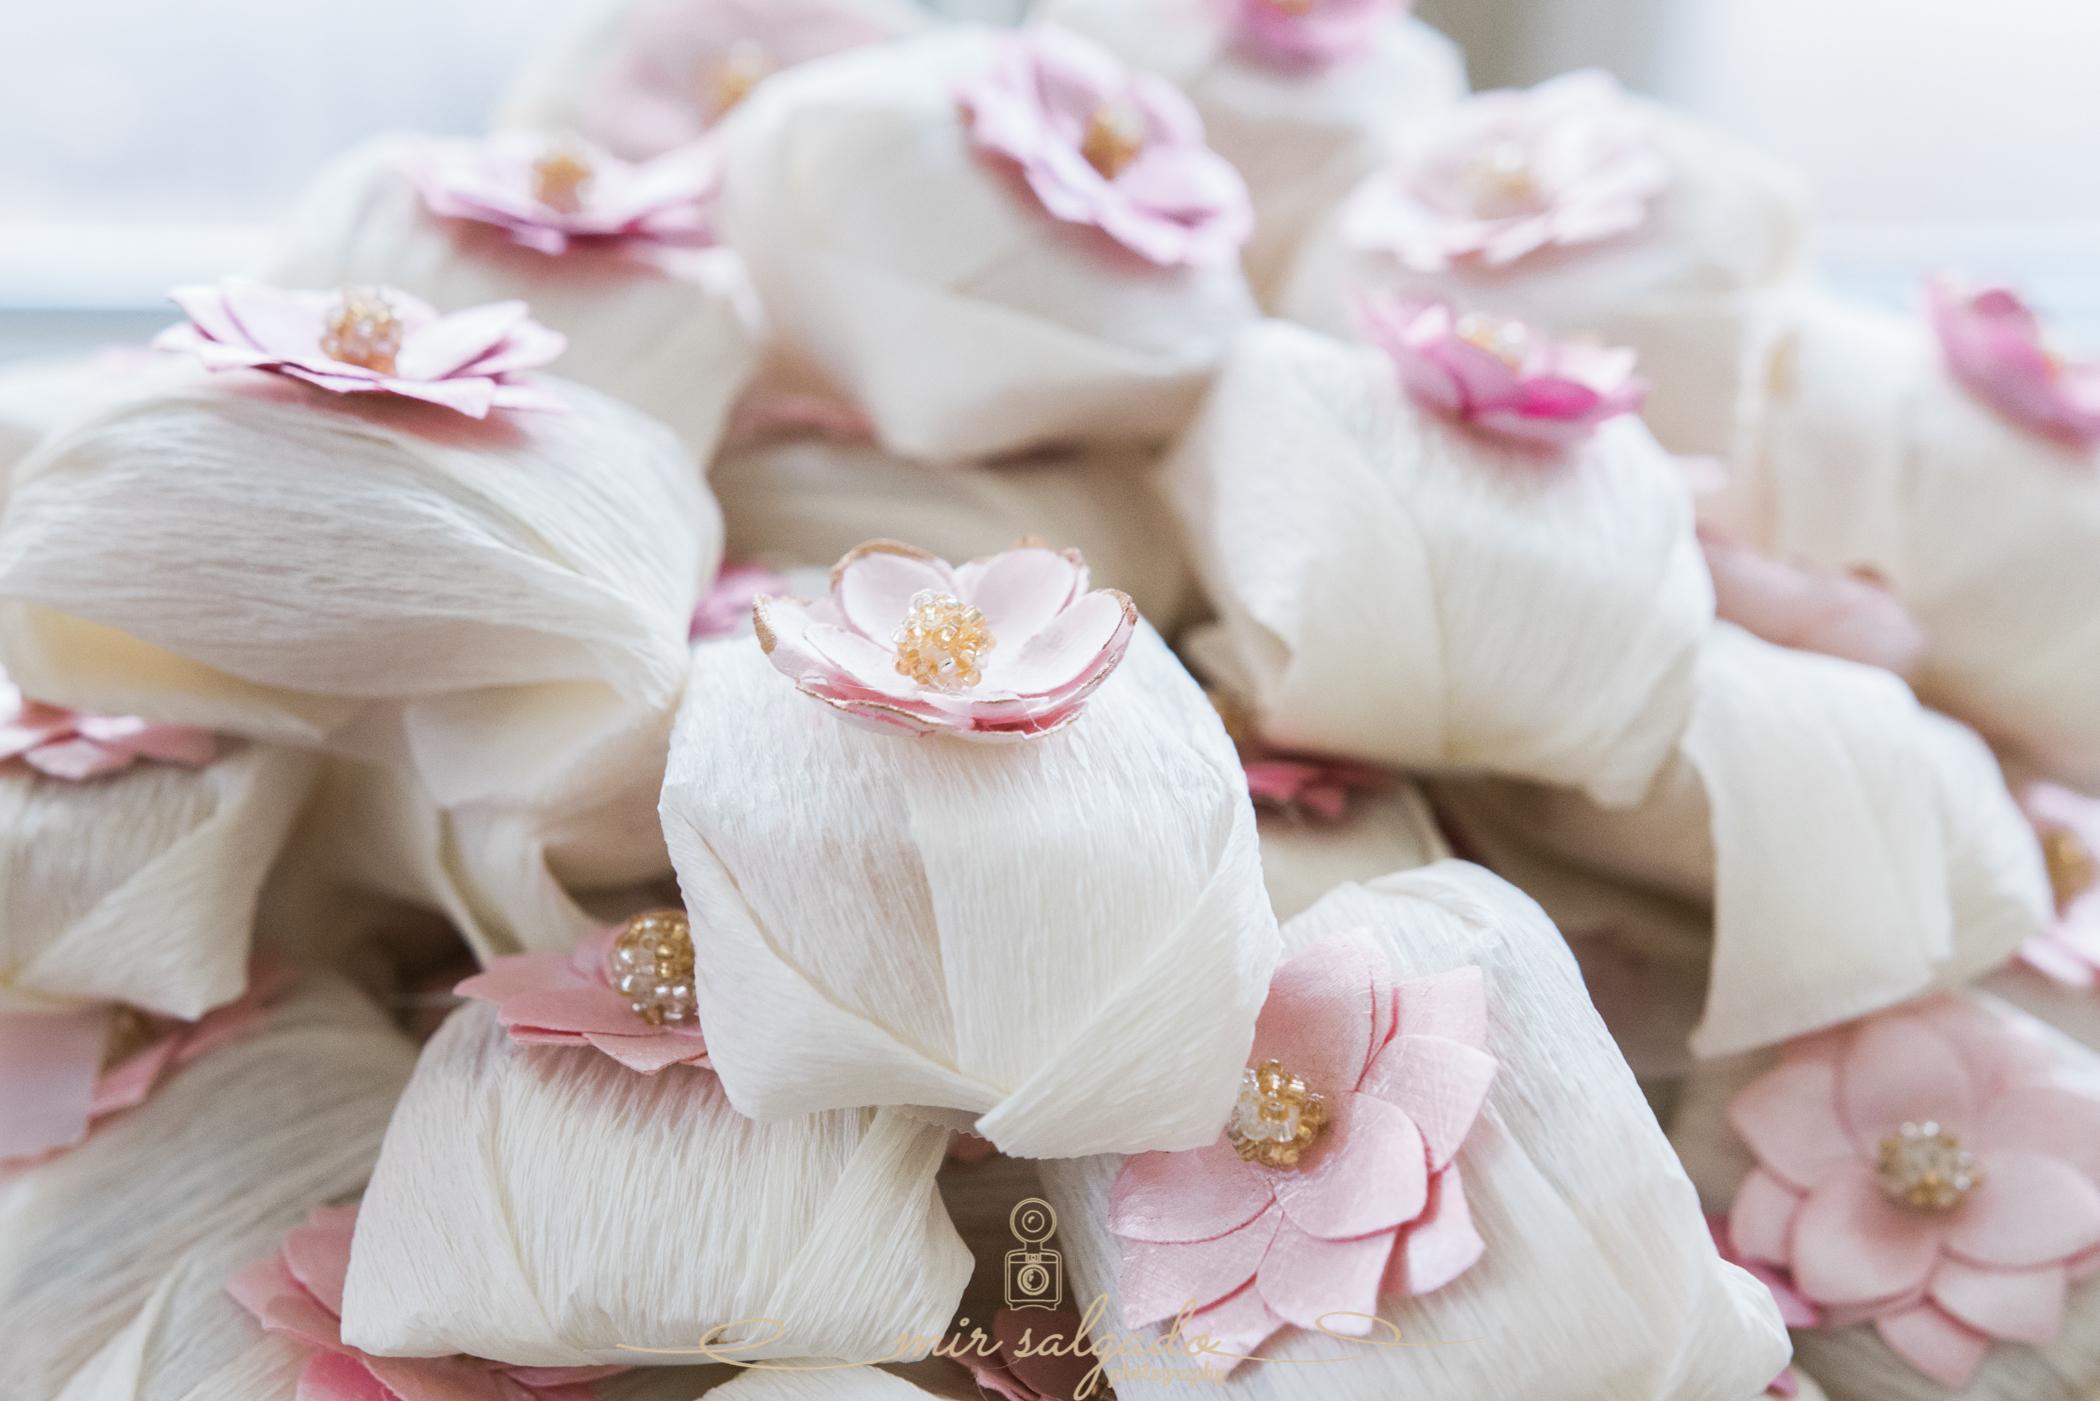 Bok-tower-gardens-wedding-details-photo, sweet-table, pink-gold-wedding